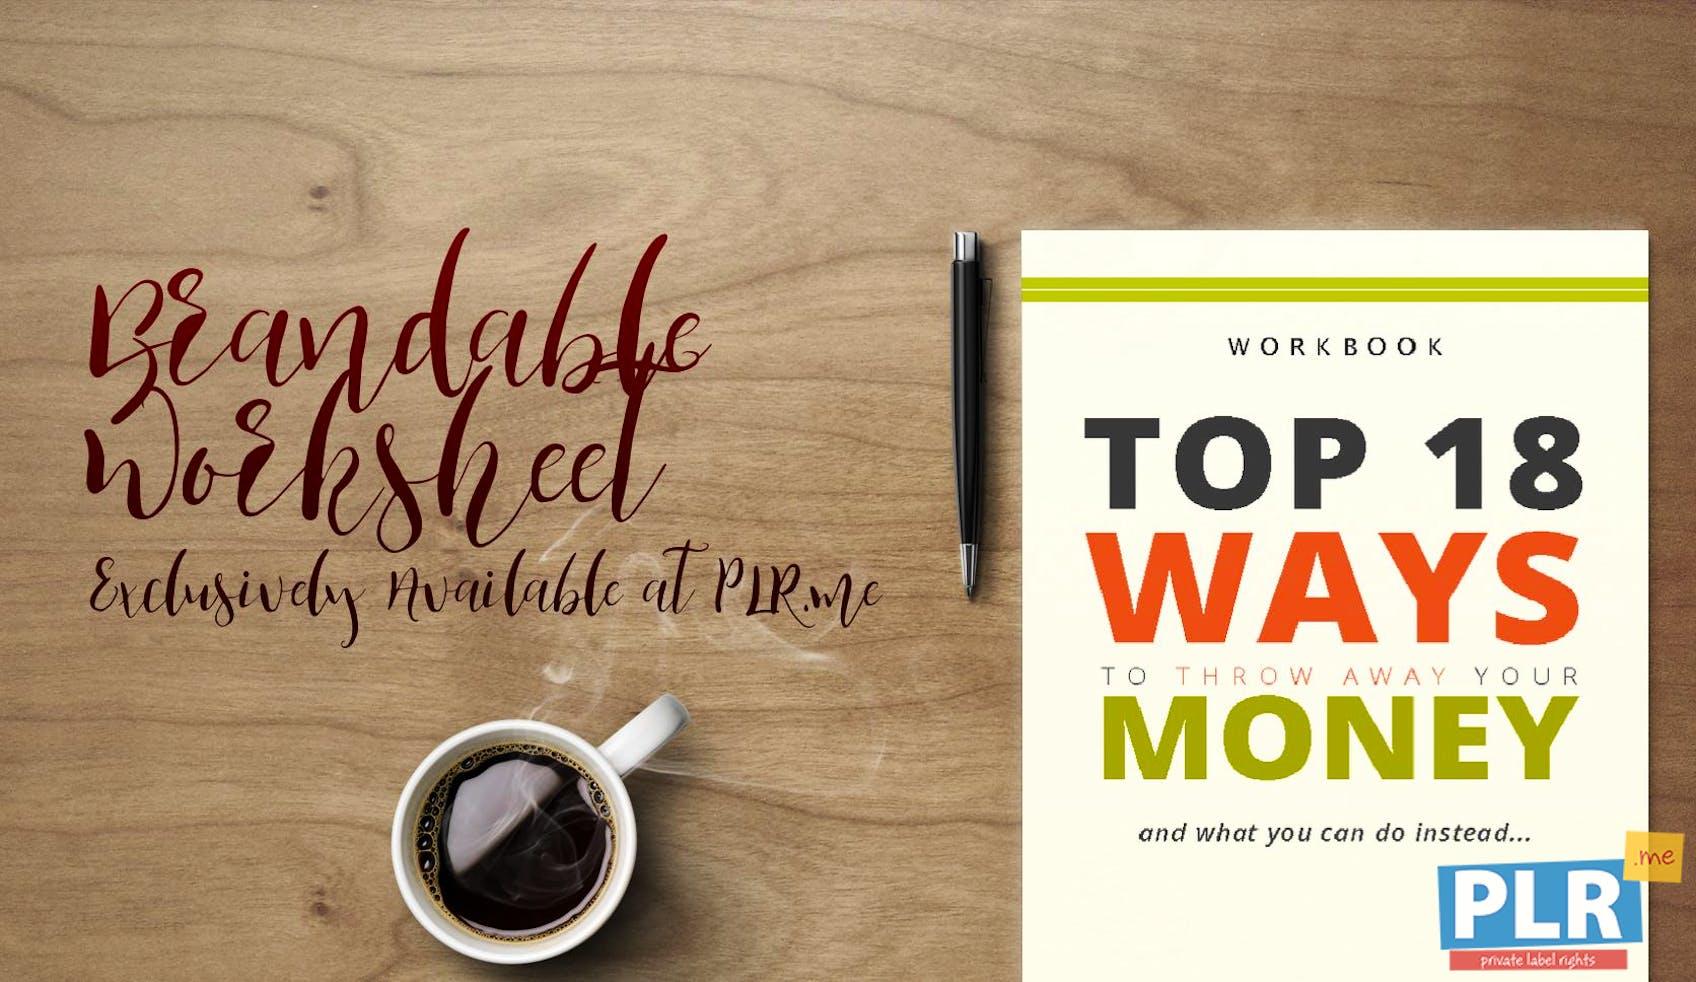 Top 18 Ways To Throw Away Your Money Workbook